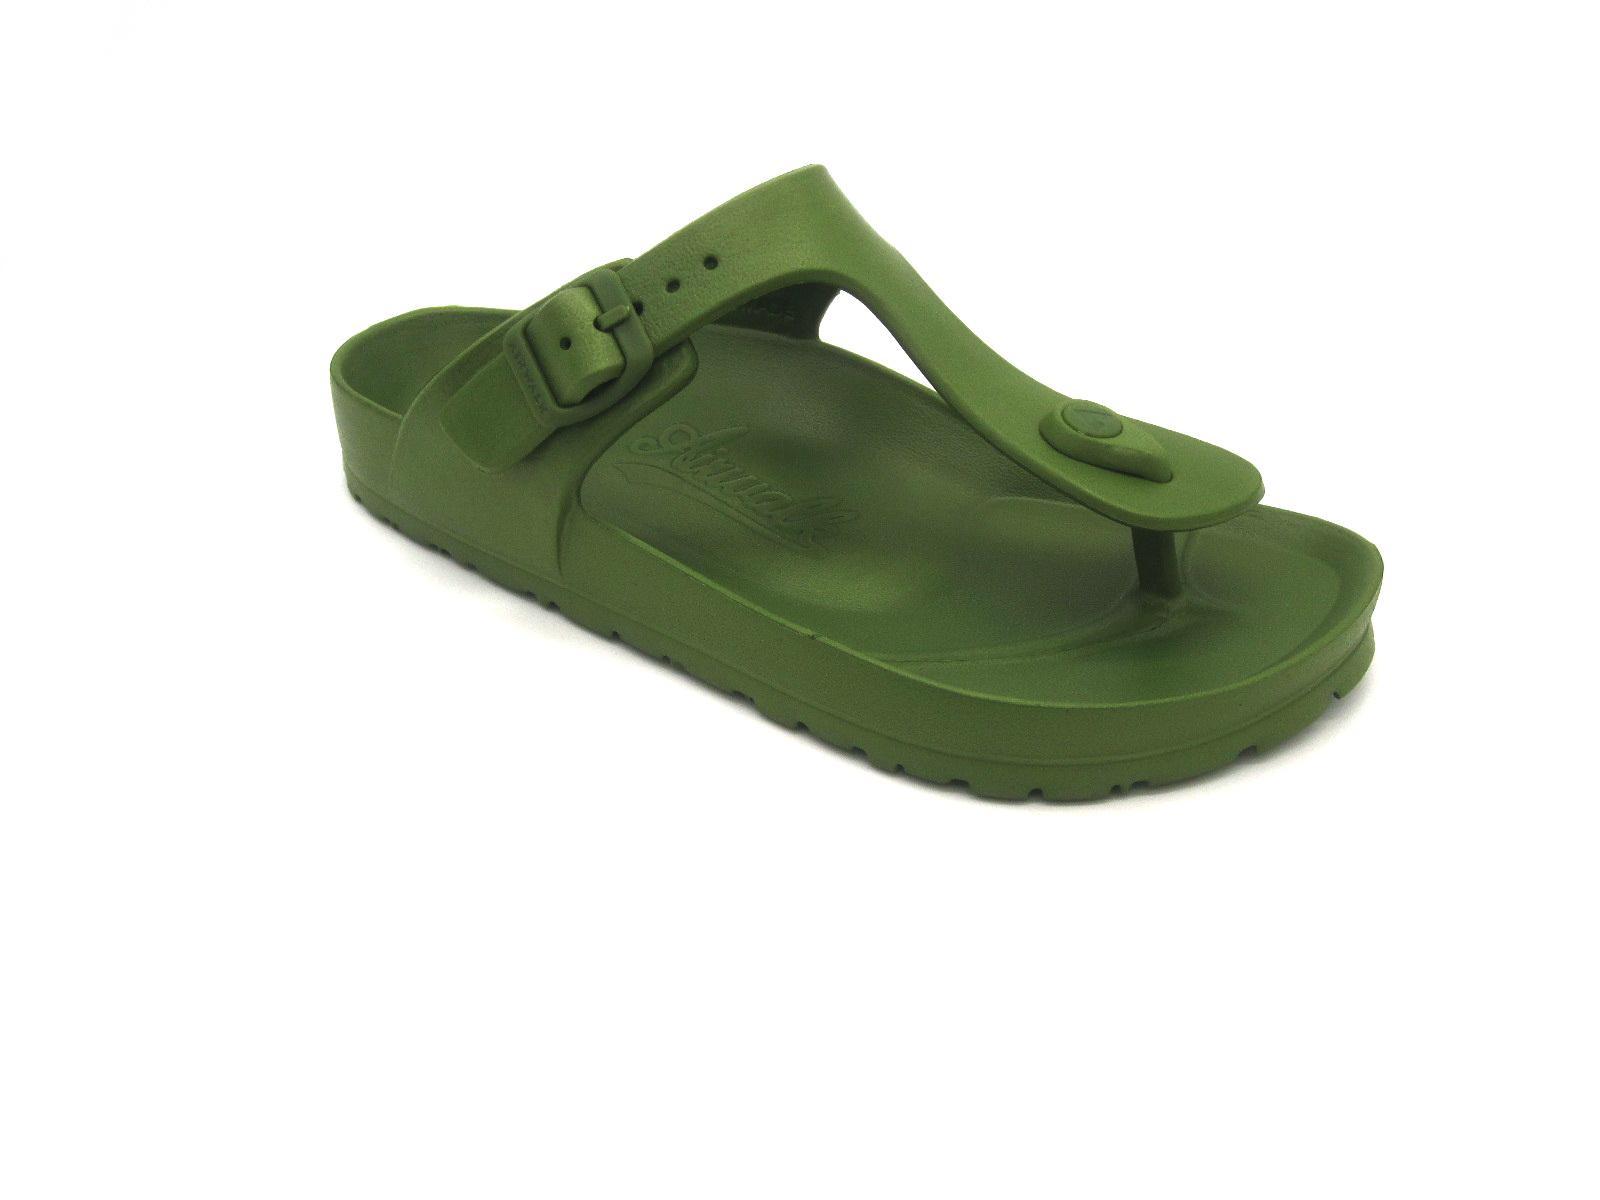 3b1b3dd7e9b5 Airwalk Footwear Philippines  Airwalk Footwear price list - Slippers ...